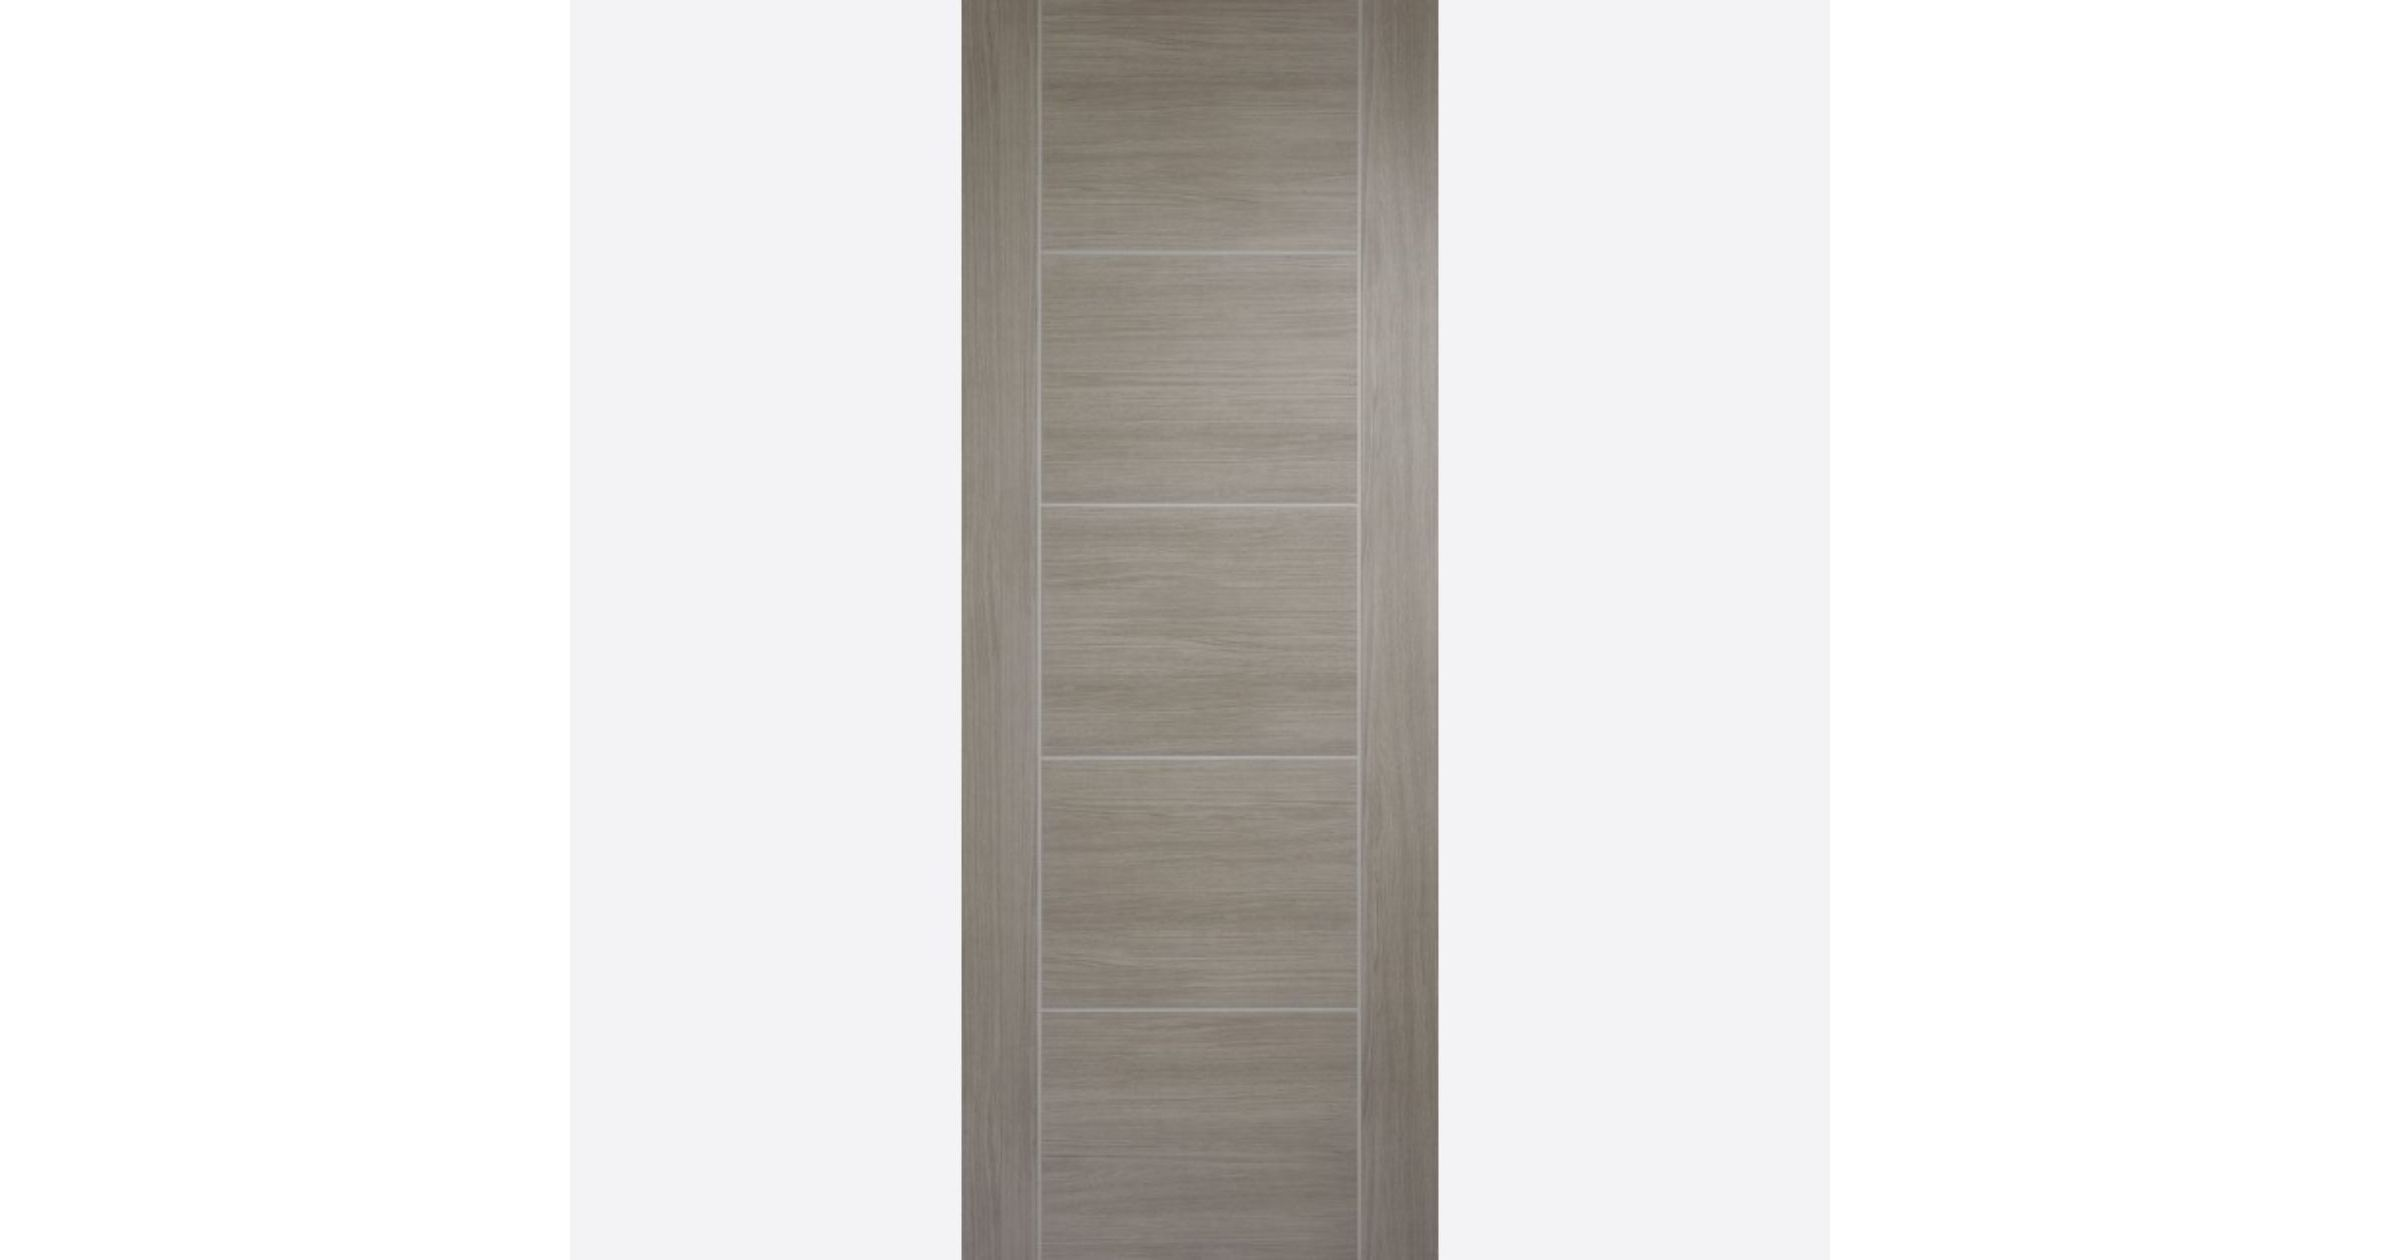 Vancouver Door Flush *Pre-Finished Light Grey Laminate* 35mm Internal - LPD Laminate Doors & Vancouver Door: Flush *Pre-Finished Light Grey Laminate* 35mm Internal - LPD Laminate Doors